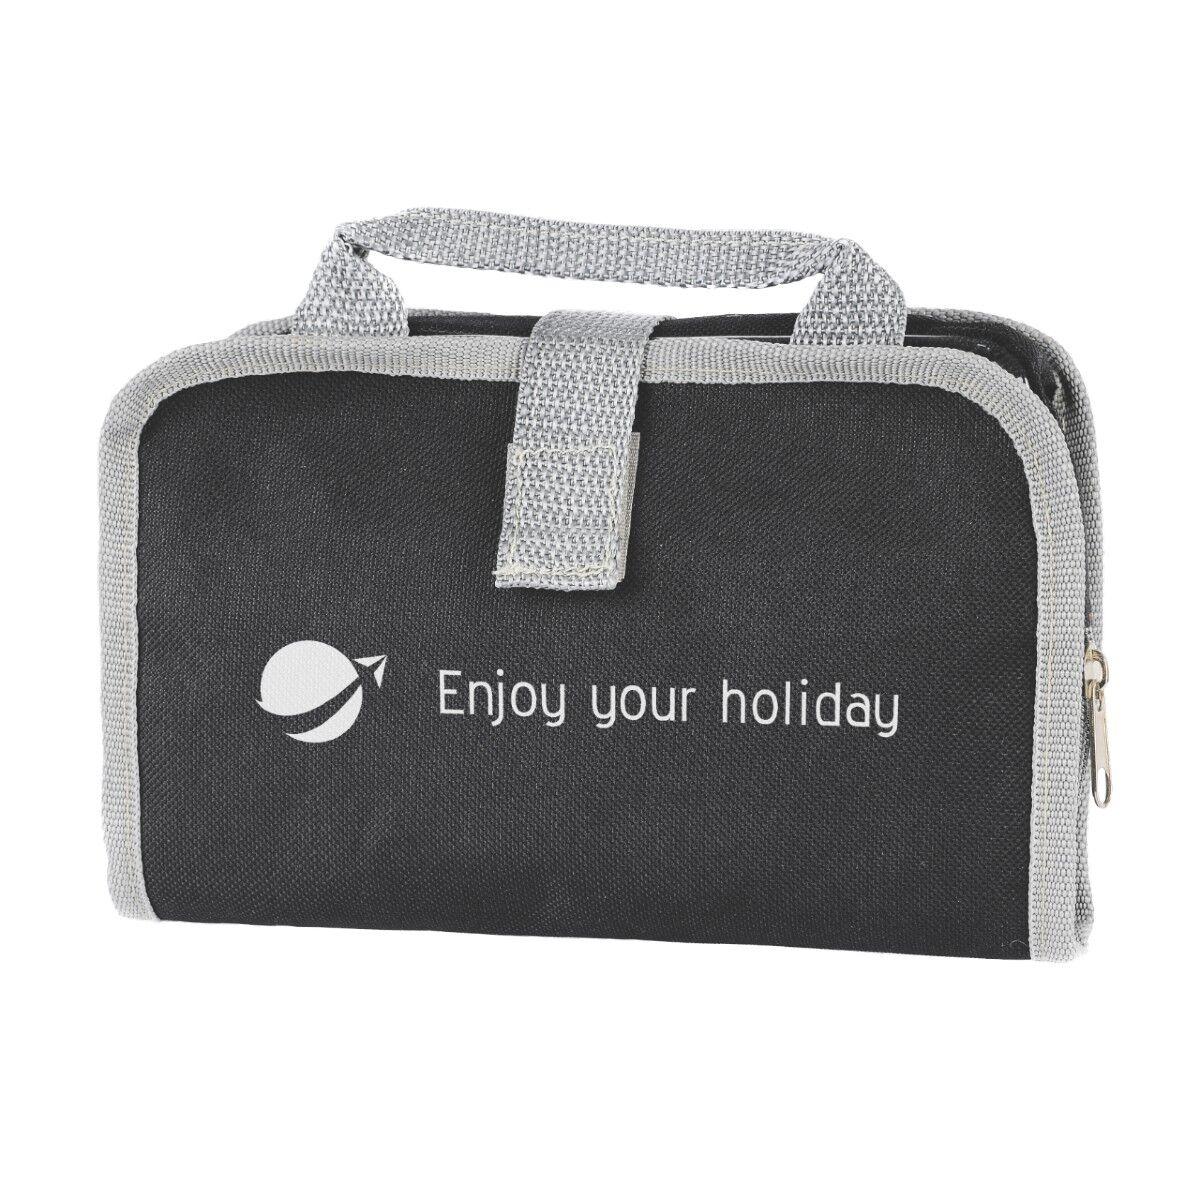 Enterprise Cosmetics Travel Bag Black